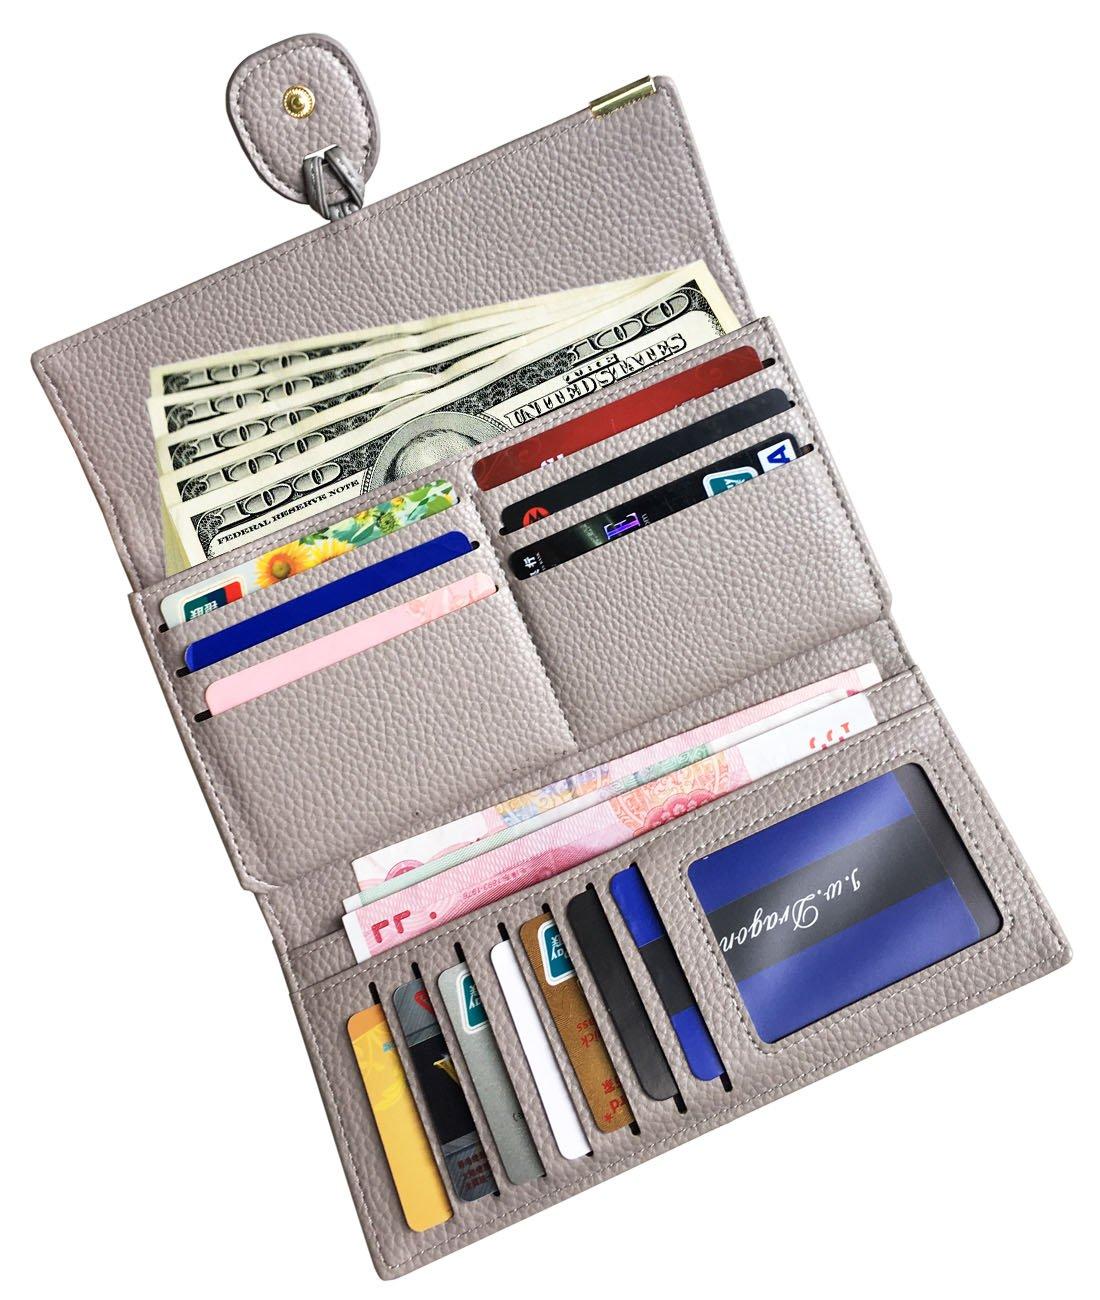 Rfid Blocking Leather wallet for women Girls,ladies long purse Large Capacity(Grey) by YOTOO (Image #2)